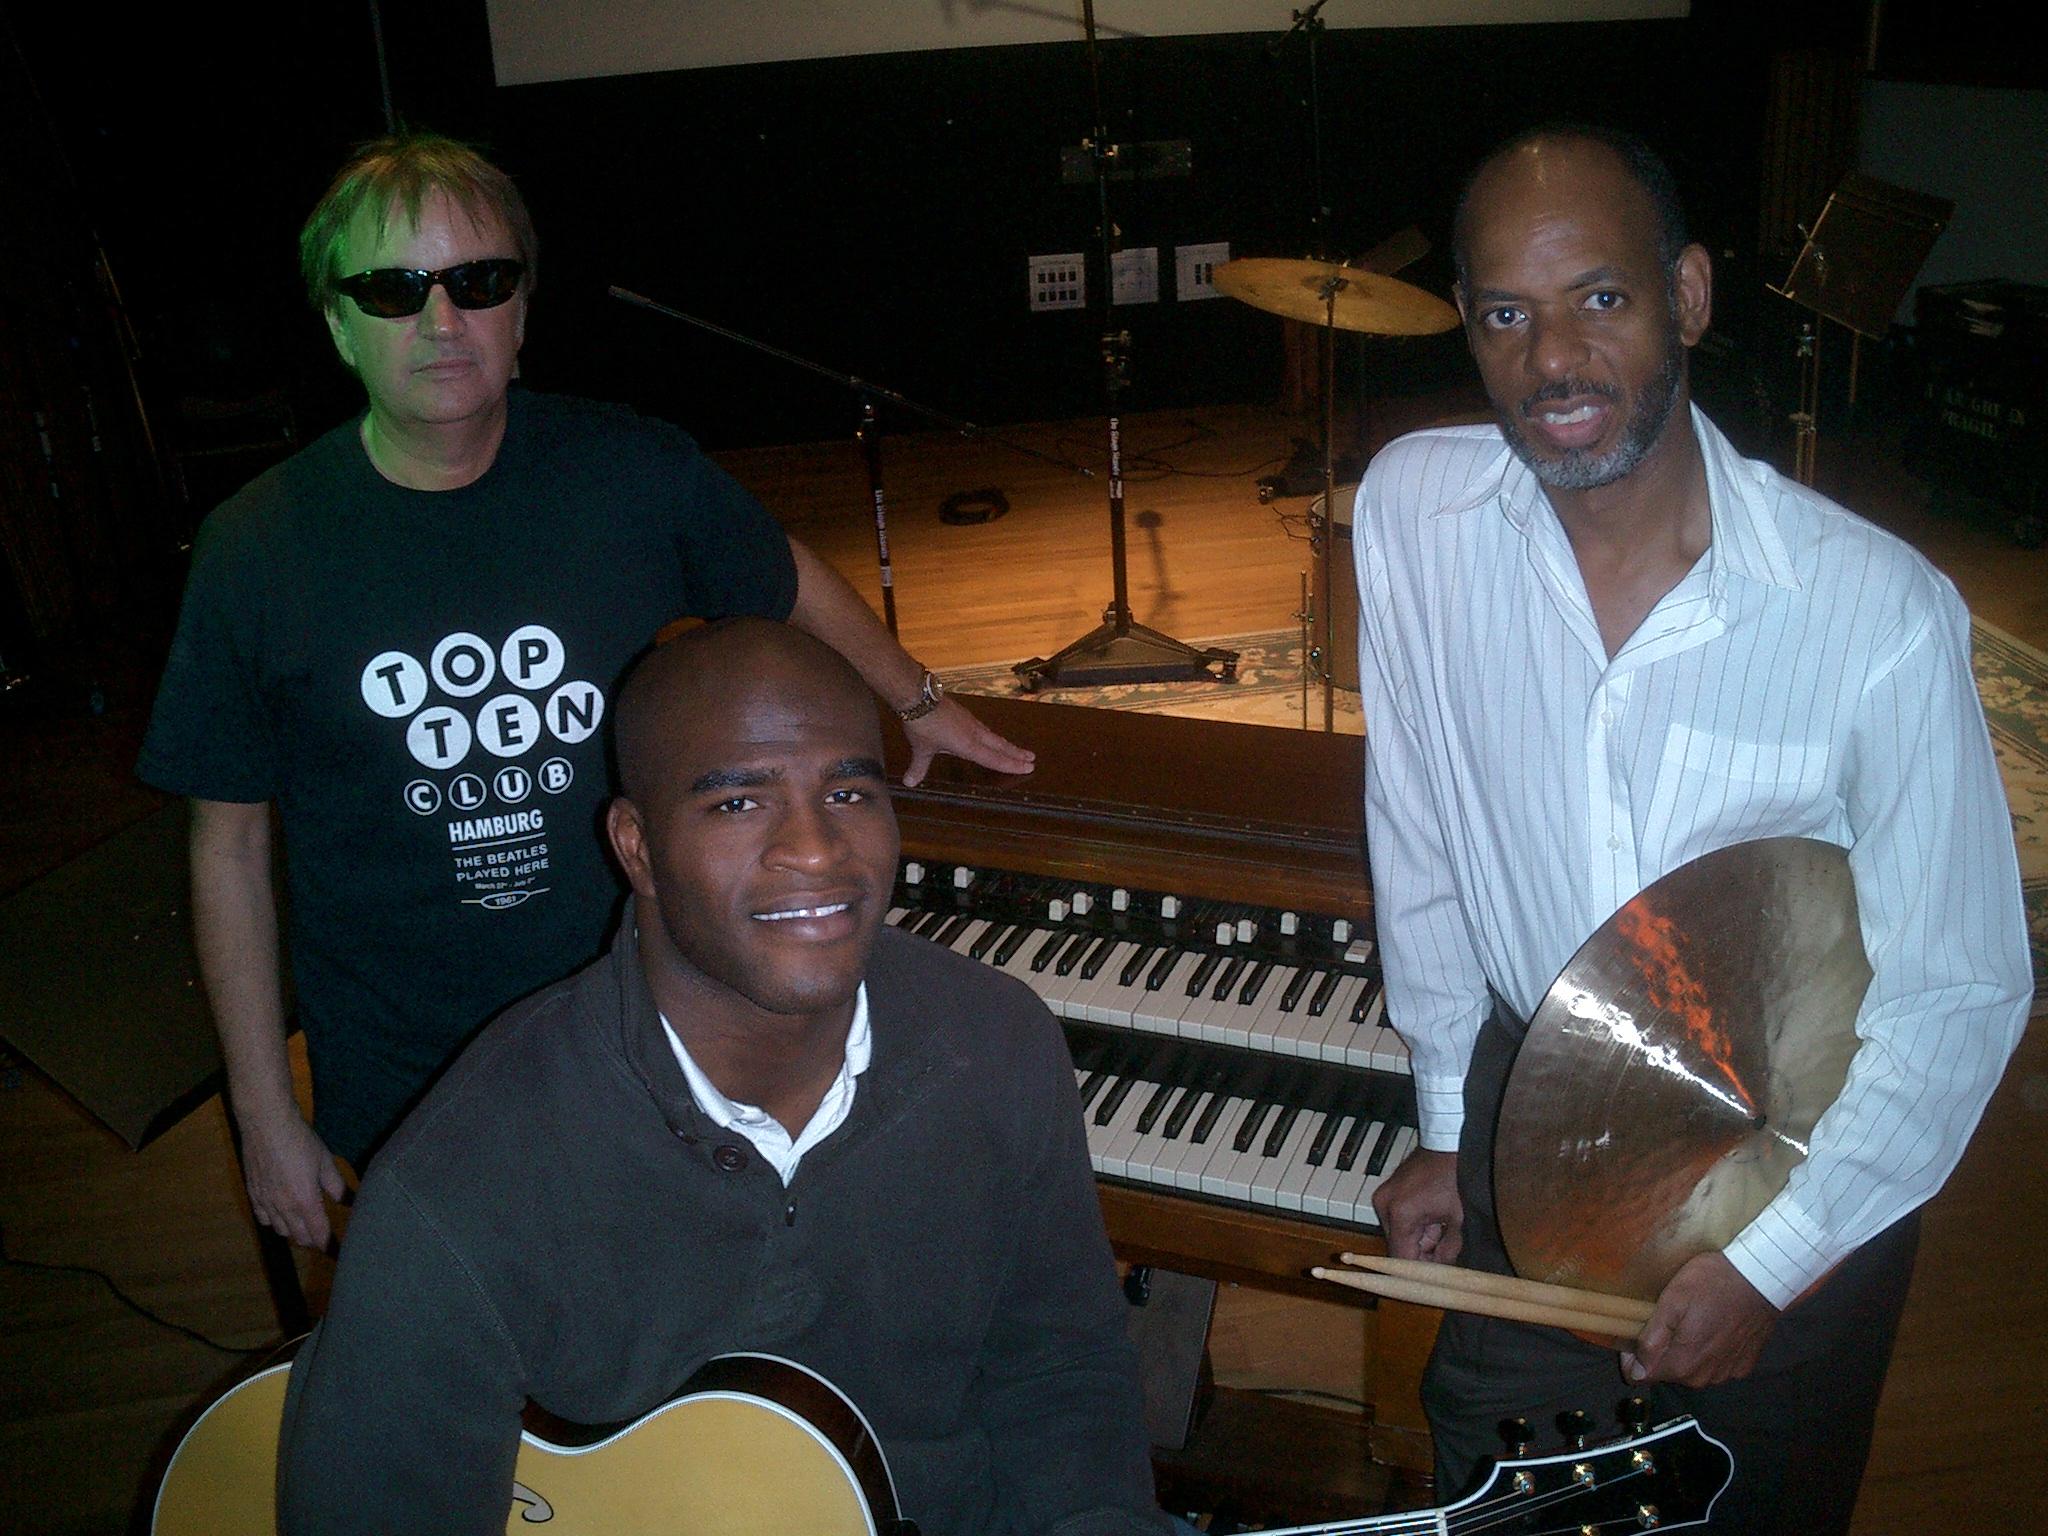 Eric Scortia, Joel Cross, Alan Green